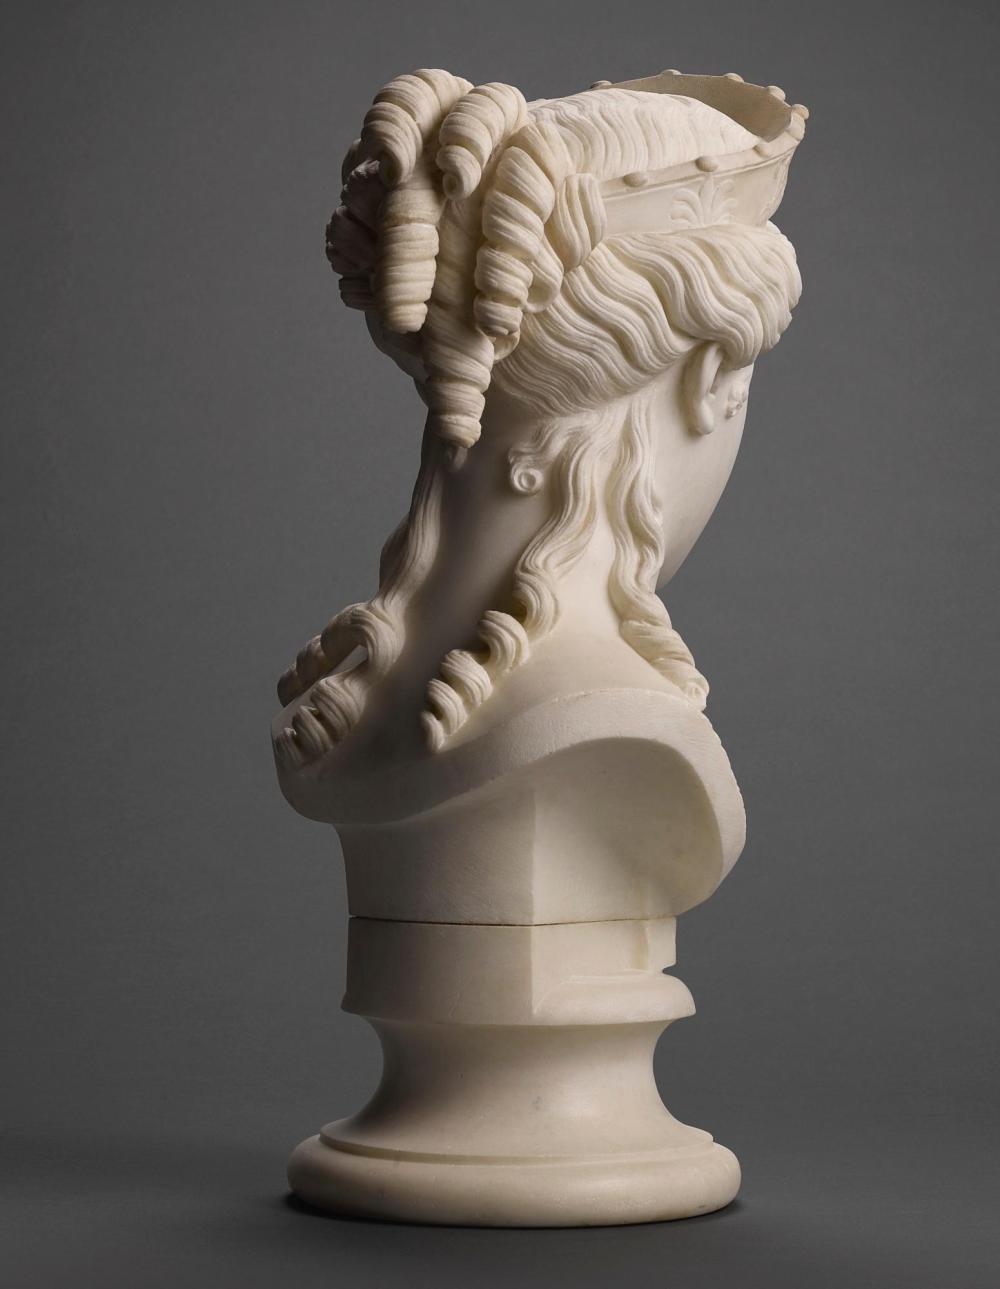 Antonio Canova (1757-1822) Italian 944dc1ca1459